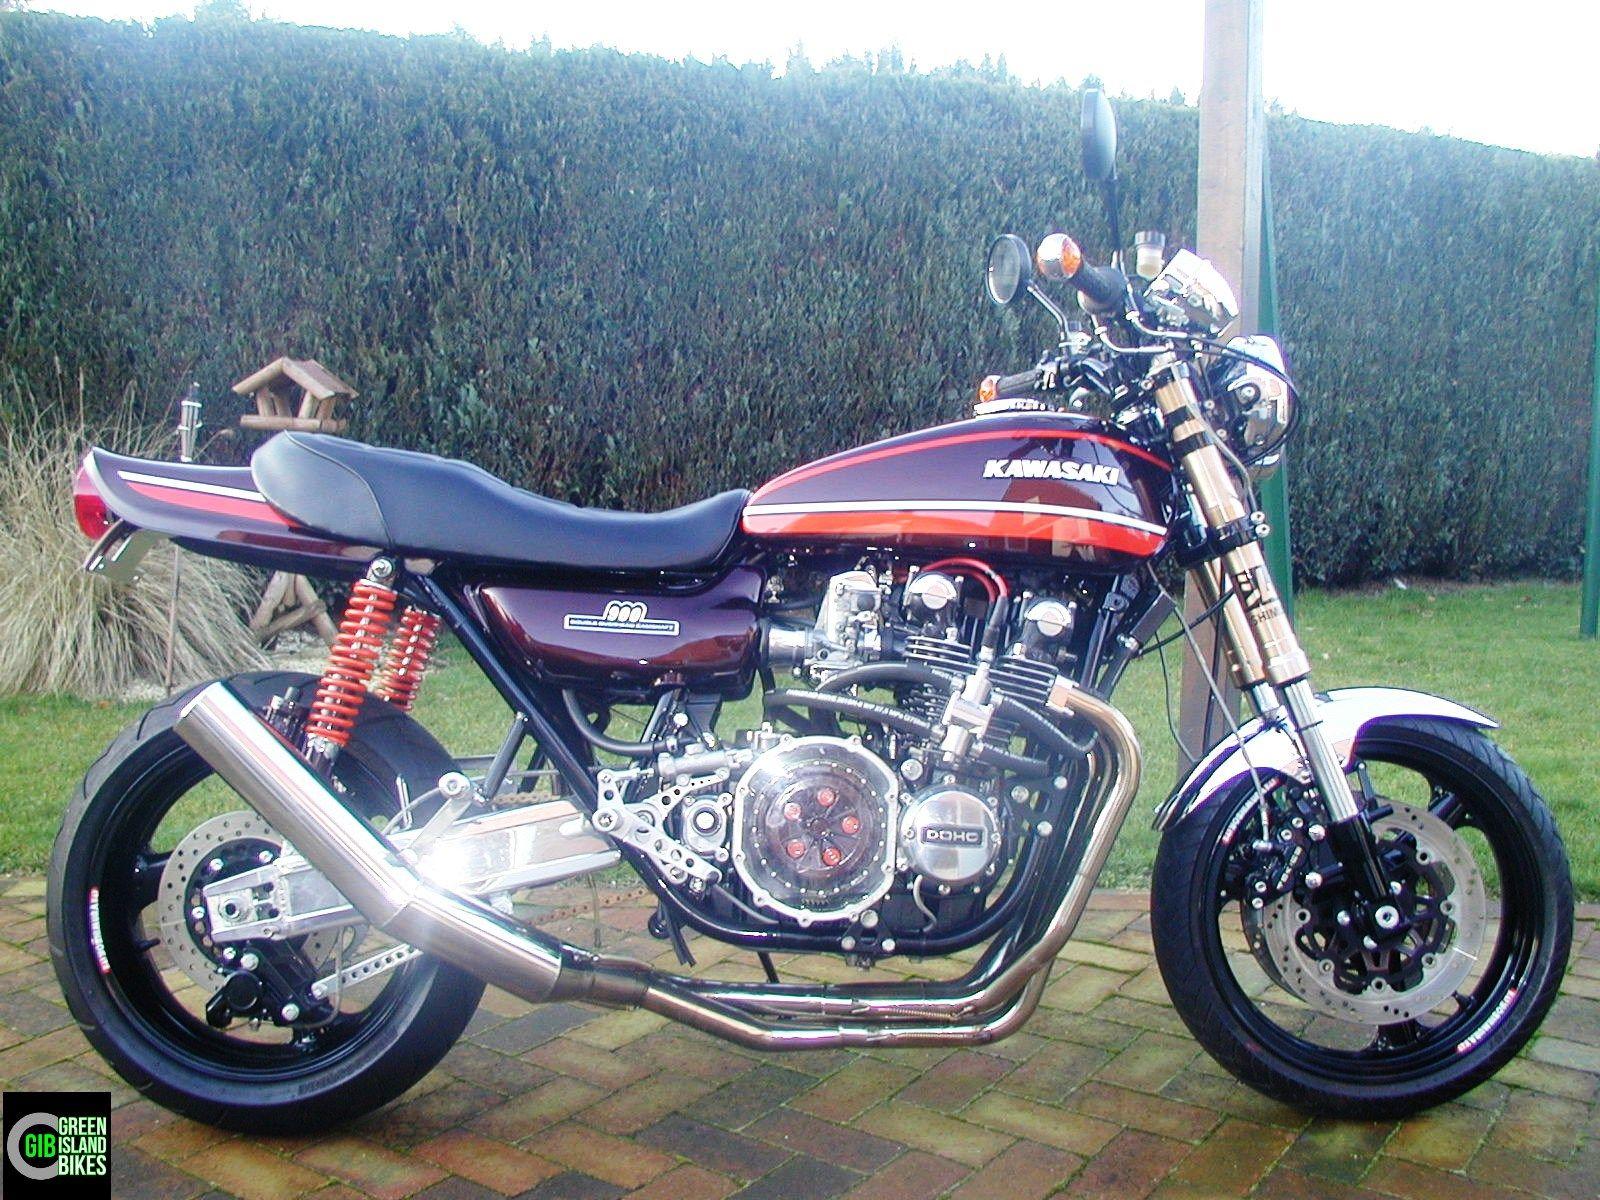 Umbau Einer Kawasaki Z 900GIB Custombikes Von Green Island Bikes